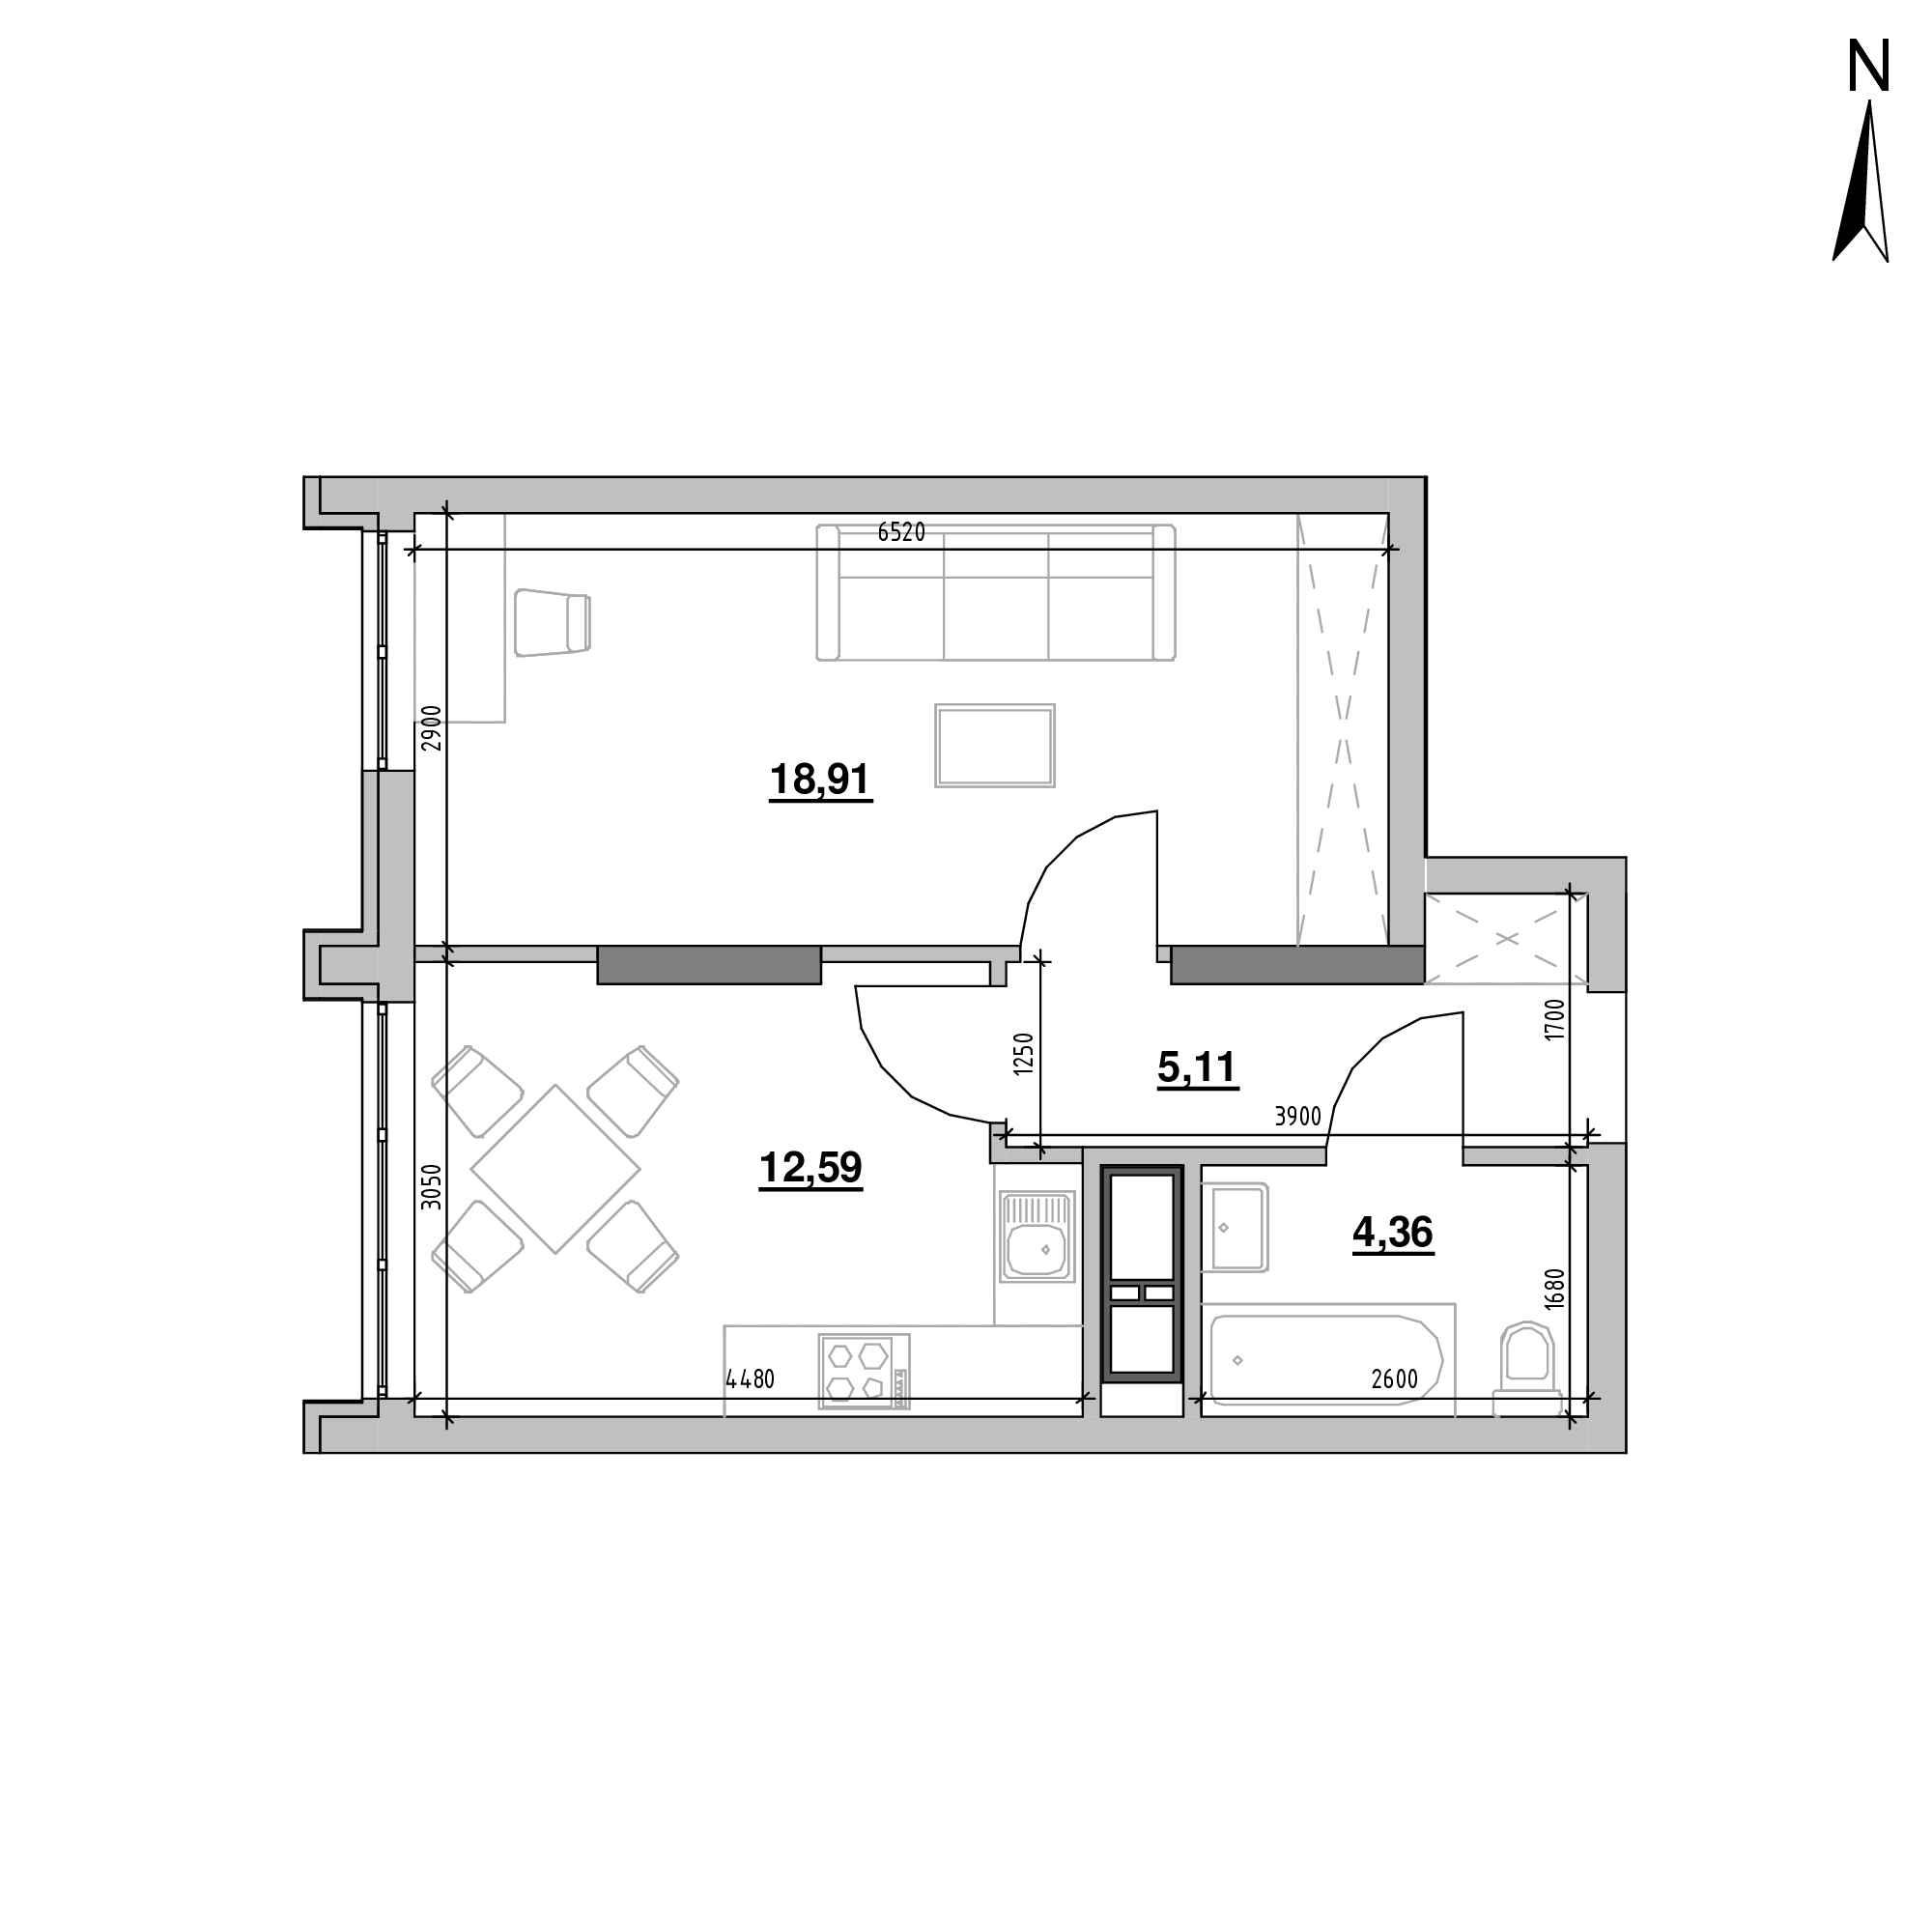 ЖК Nordica Residence: планування 1-кімнатної квартири, №115, 40.97 м<sup>2</sup>